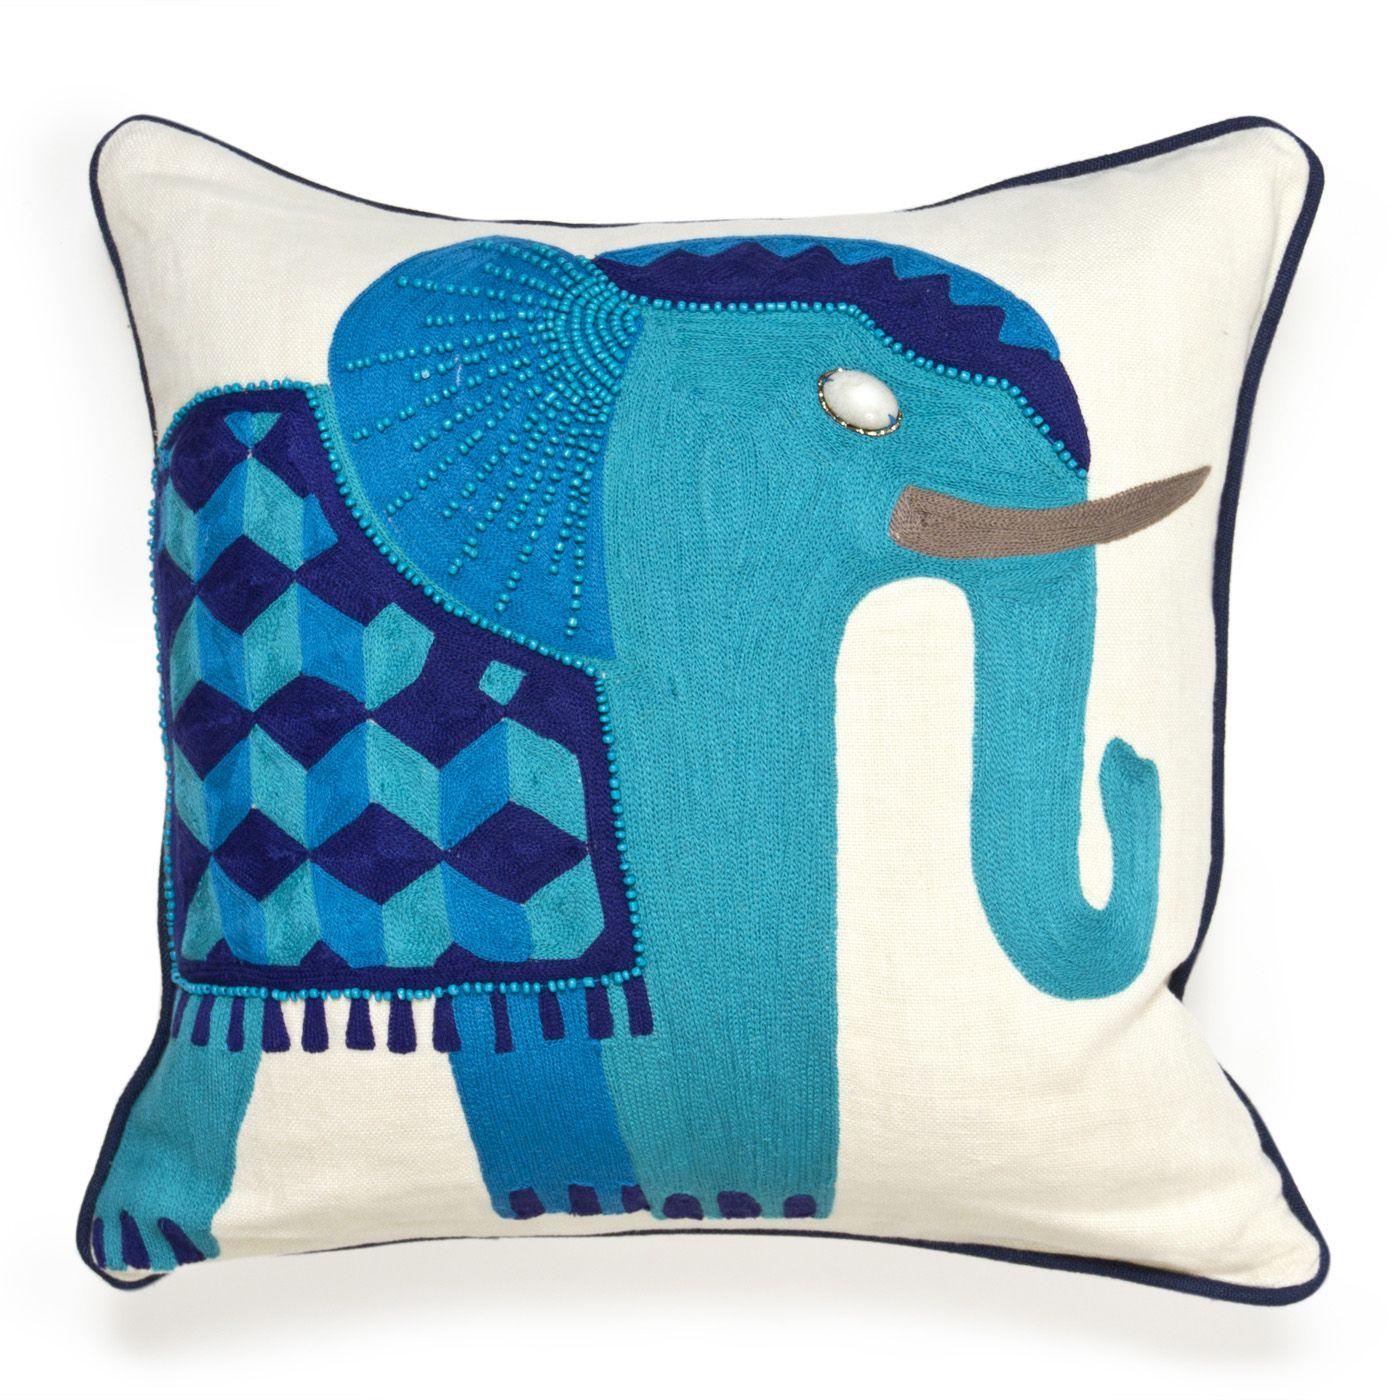 Jonathan Adler Jaipur Pillow Collection Linen Throw Pillow Elephant Throw Pillow Throw Pillows